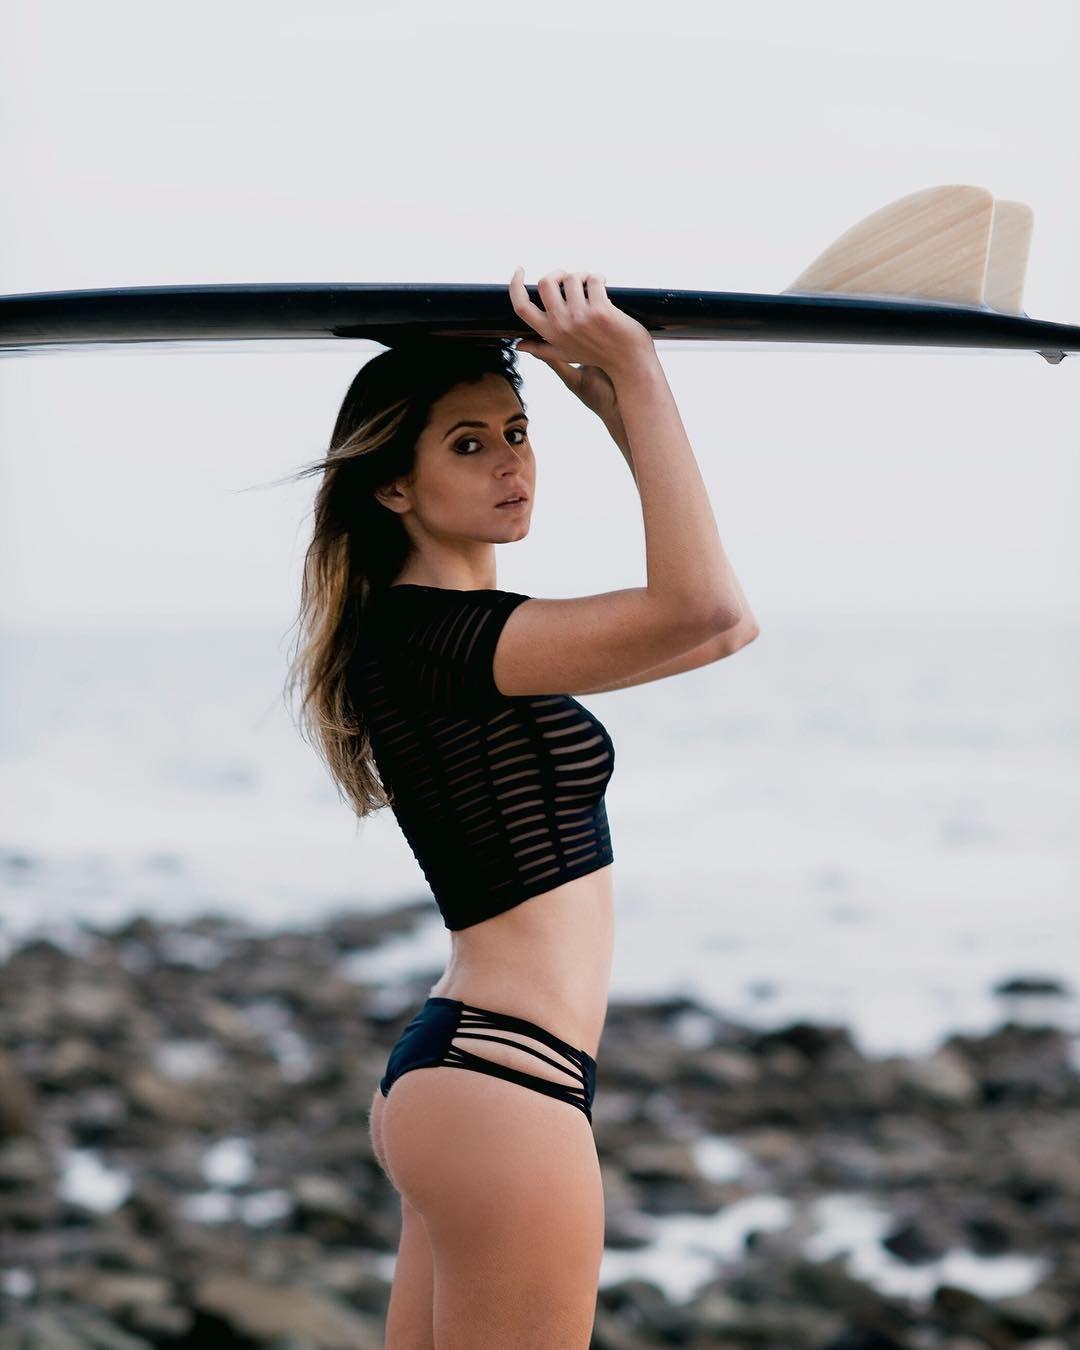 Instagram Anastasia Ashley nudes (38 photo), Tits, Cleavage, Instagram, braless 2020